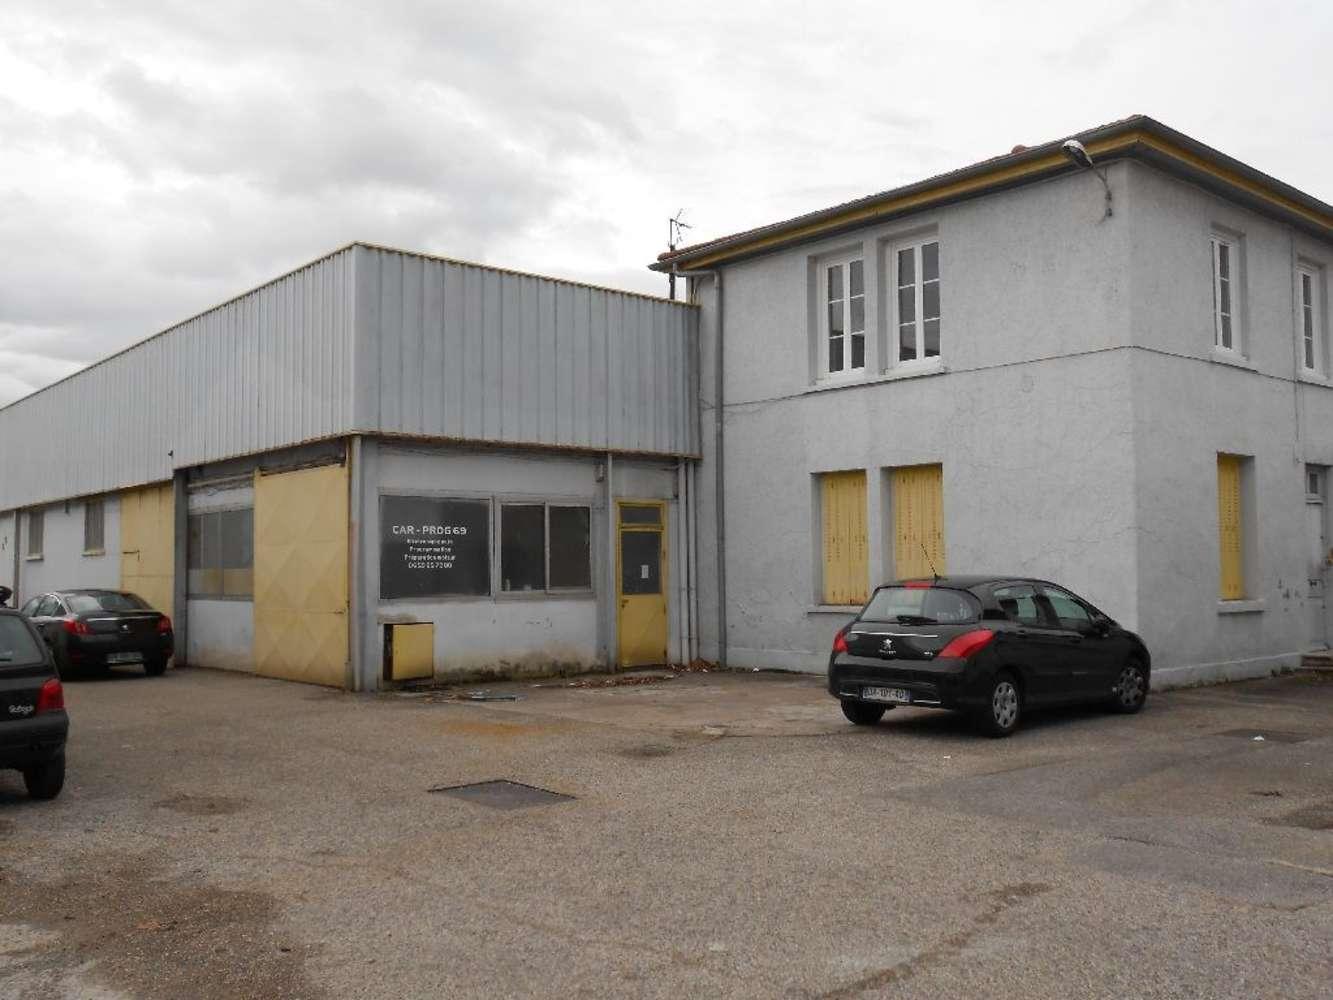 Activités/entrepôt Villeurbanne, 69100 - Location entrepot Villeurbanne ( Lyon) - 9764775